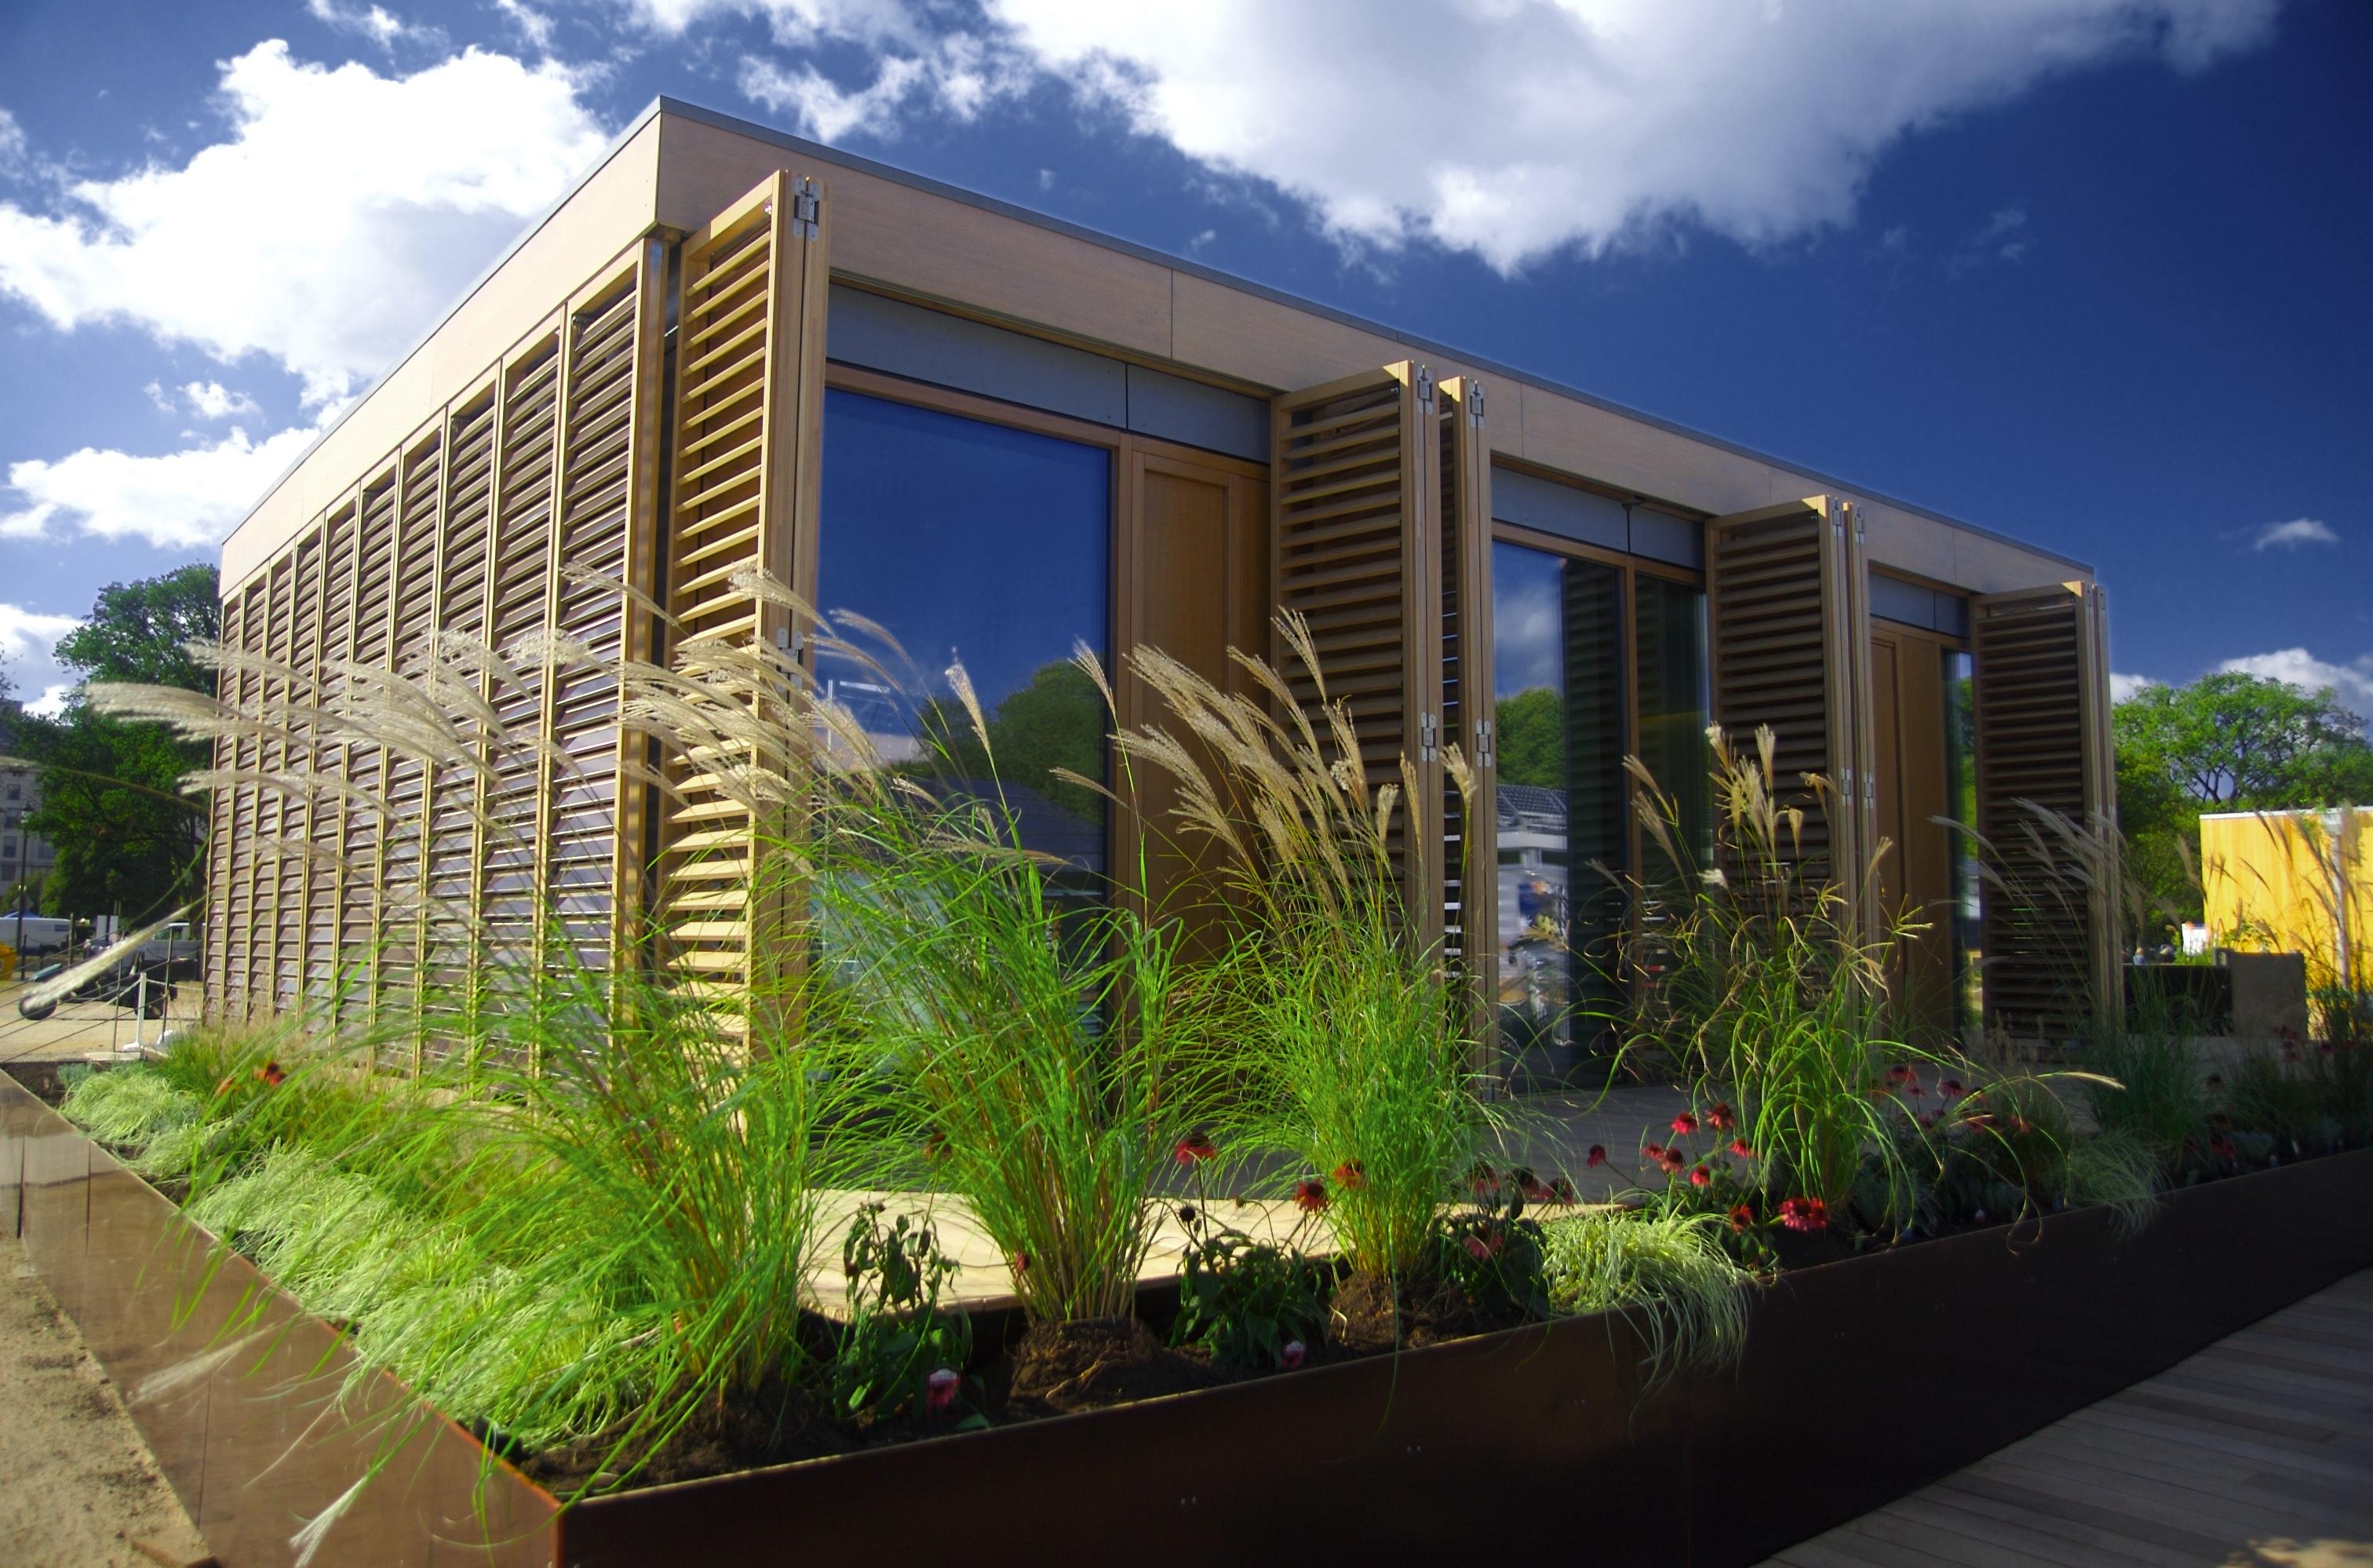 passive solar building design wikiwand. Black Bedroom Furniture Sets. Home Design Ideas